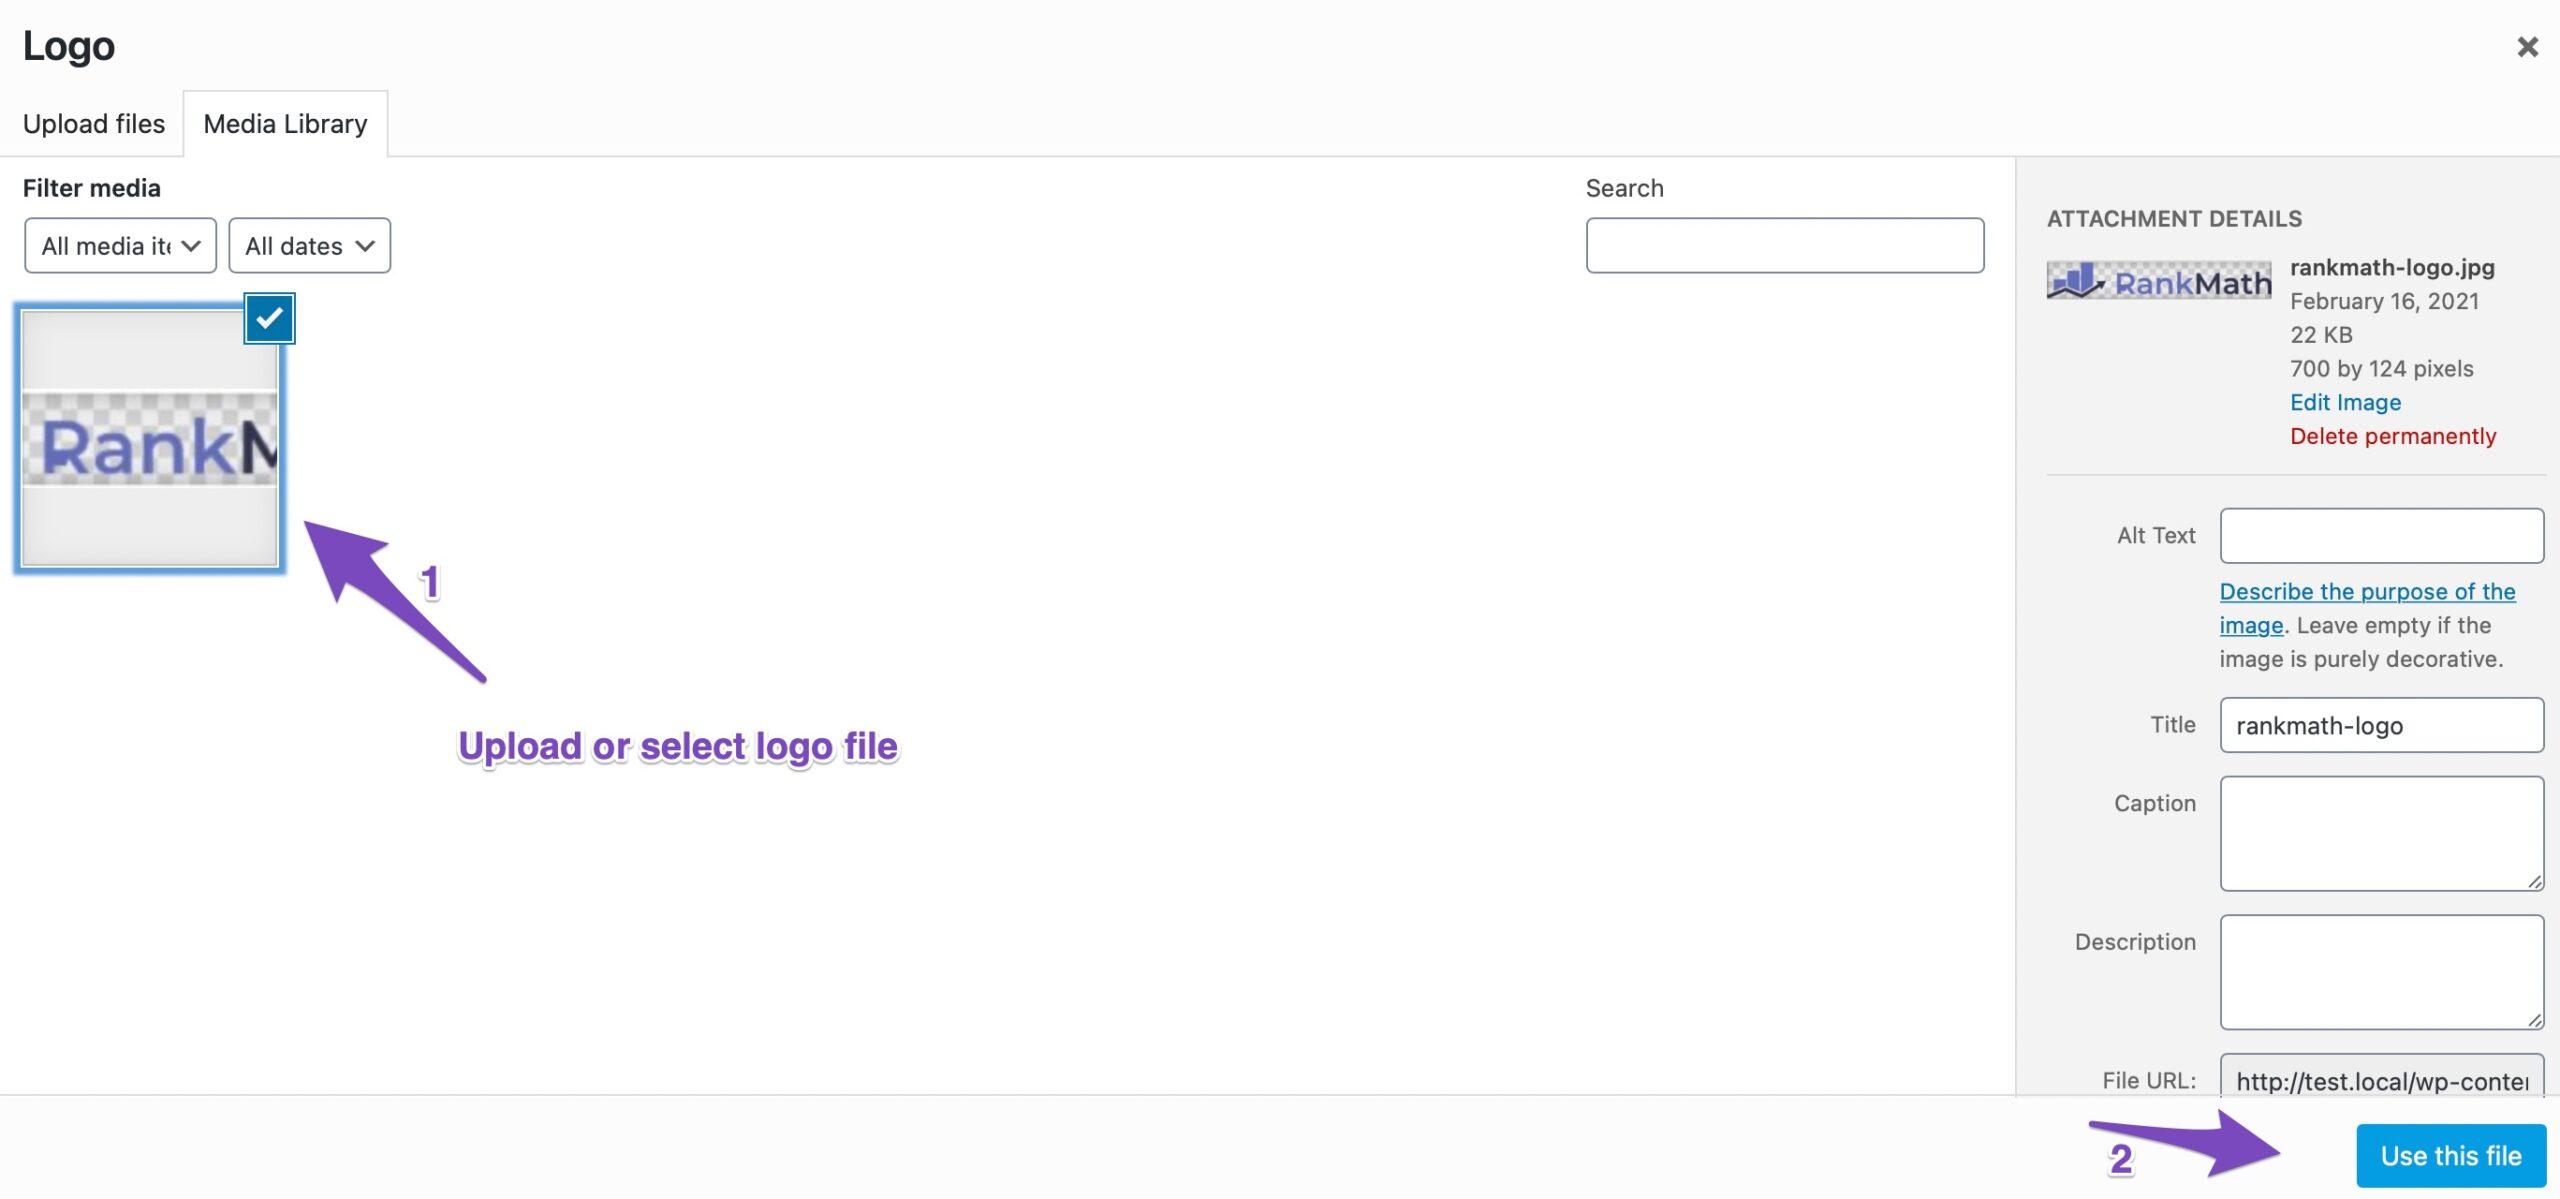 Select logo file